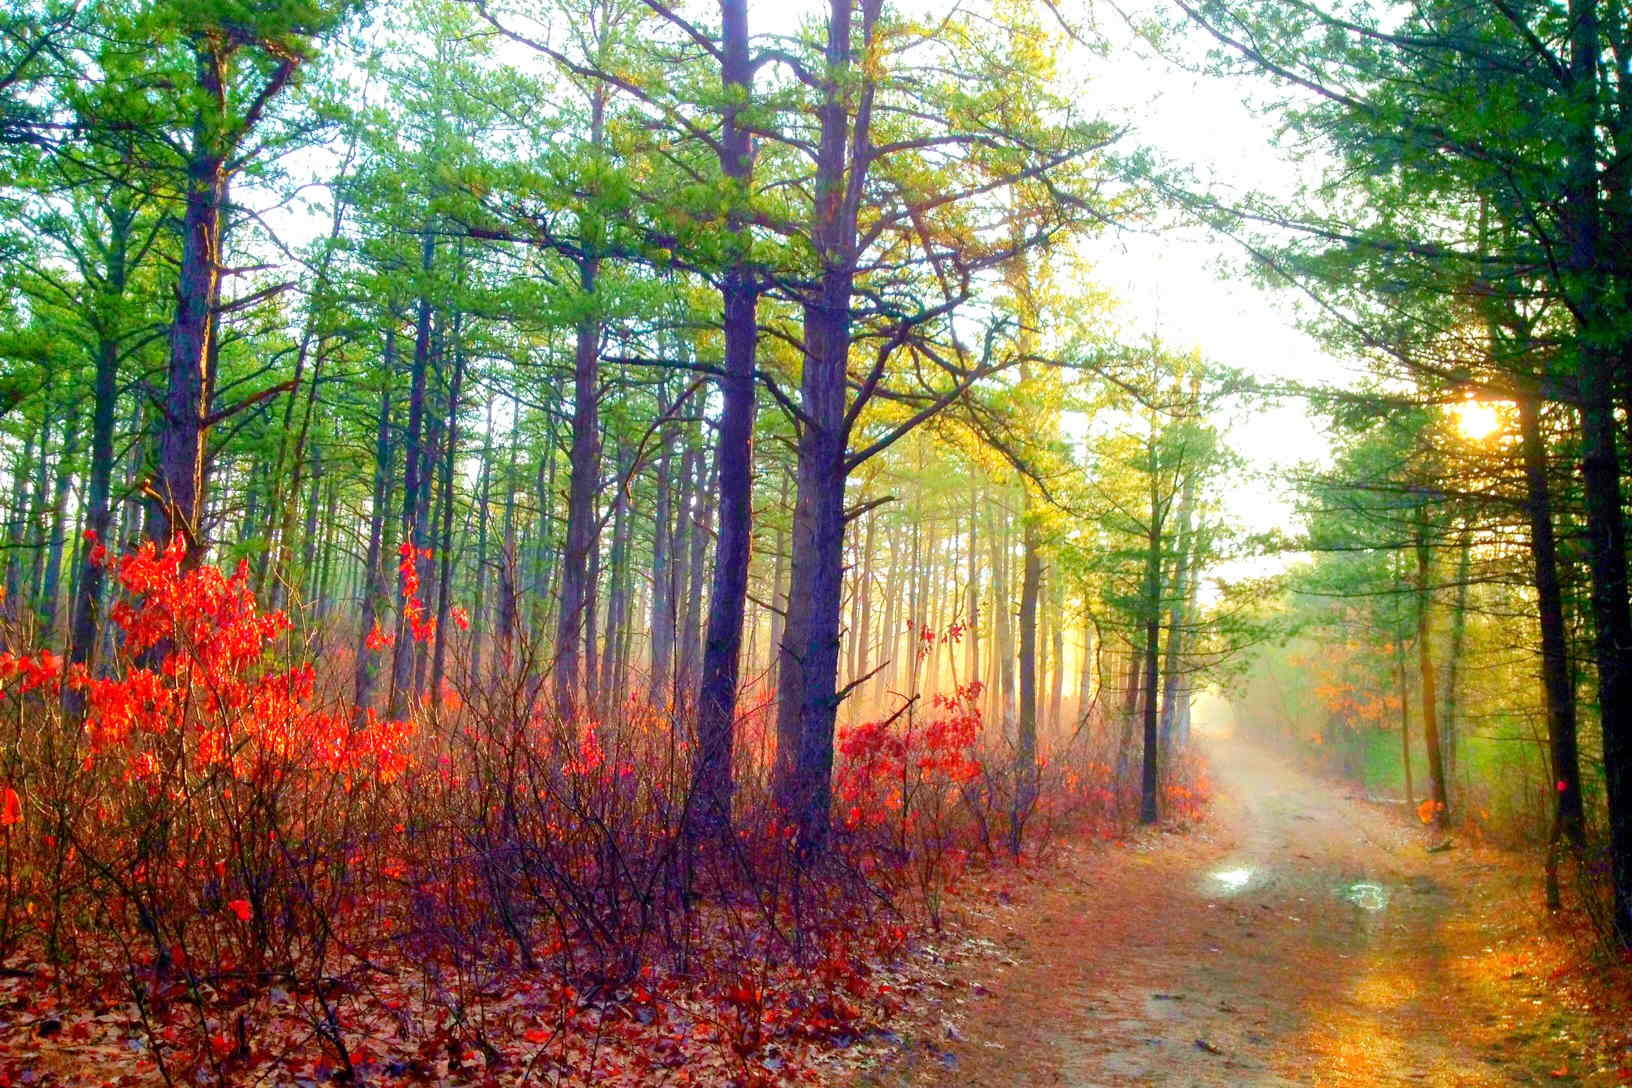 walking nature benefits miles walk amazing into